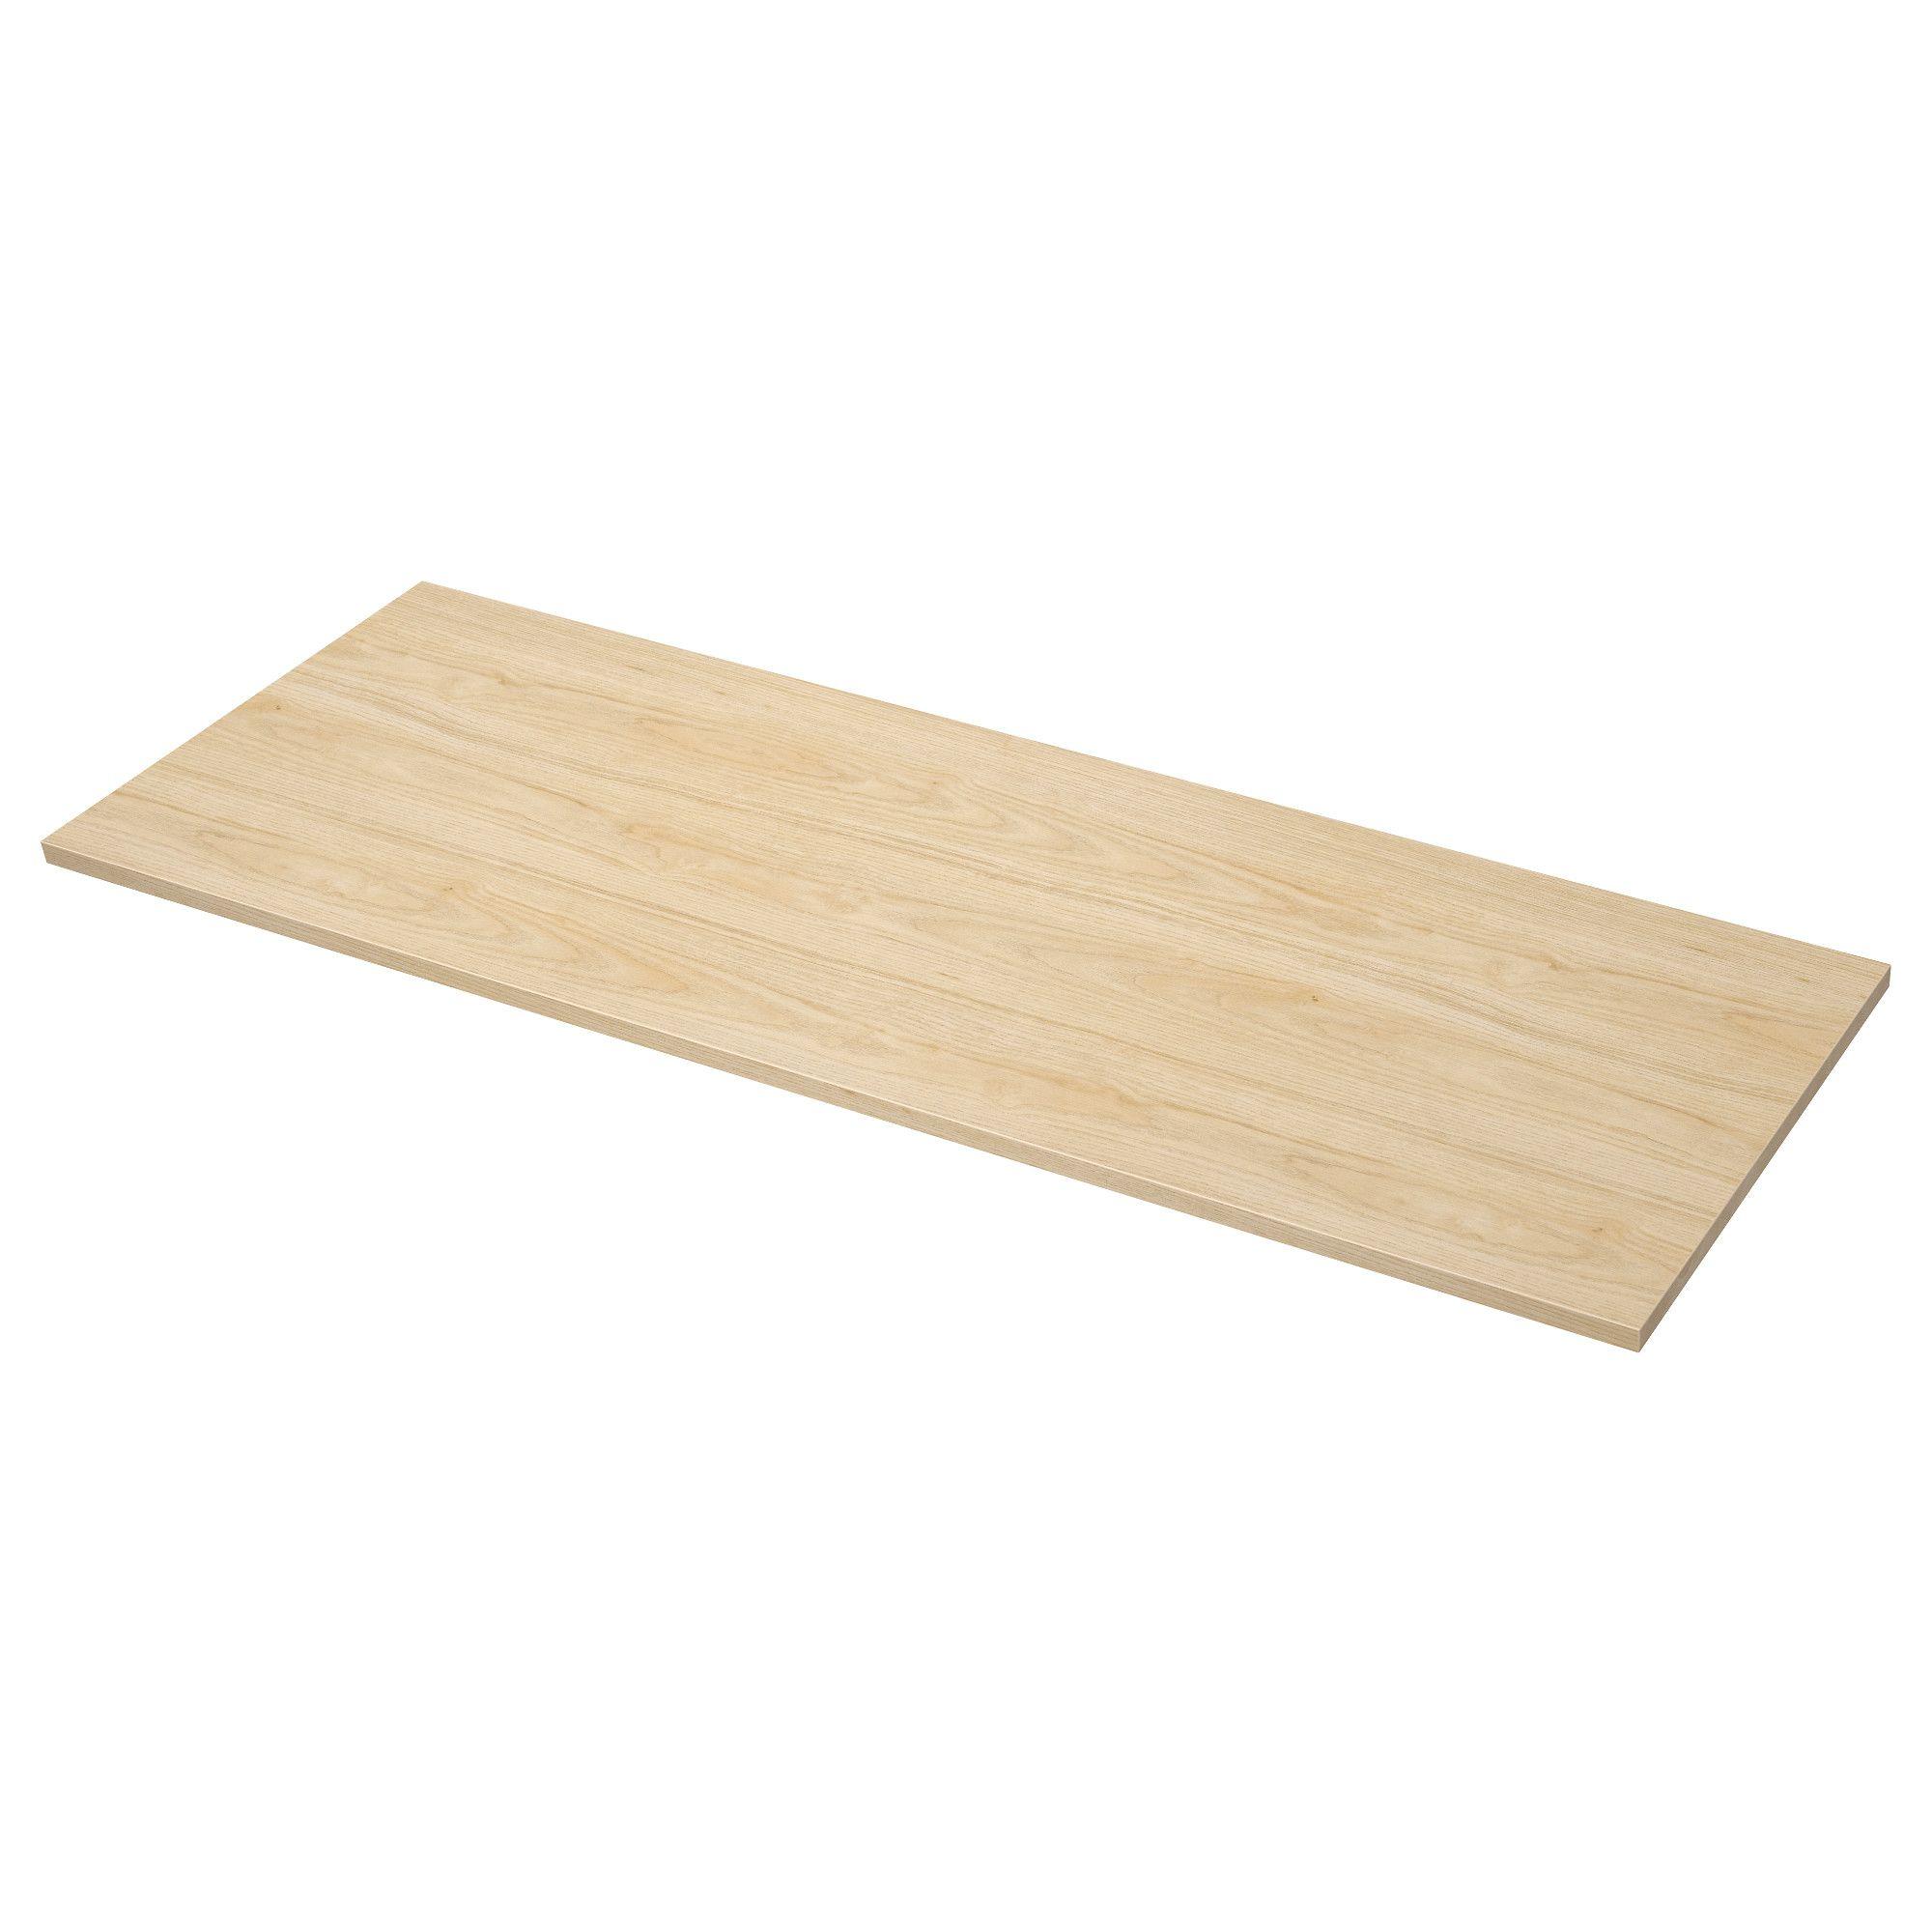 Ekbacken Bankskiva Askmonstrad Laminat 186x2 8 Cm Ikea Countertops Laminate Countertops Laminate